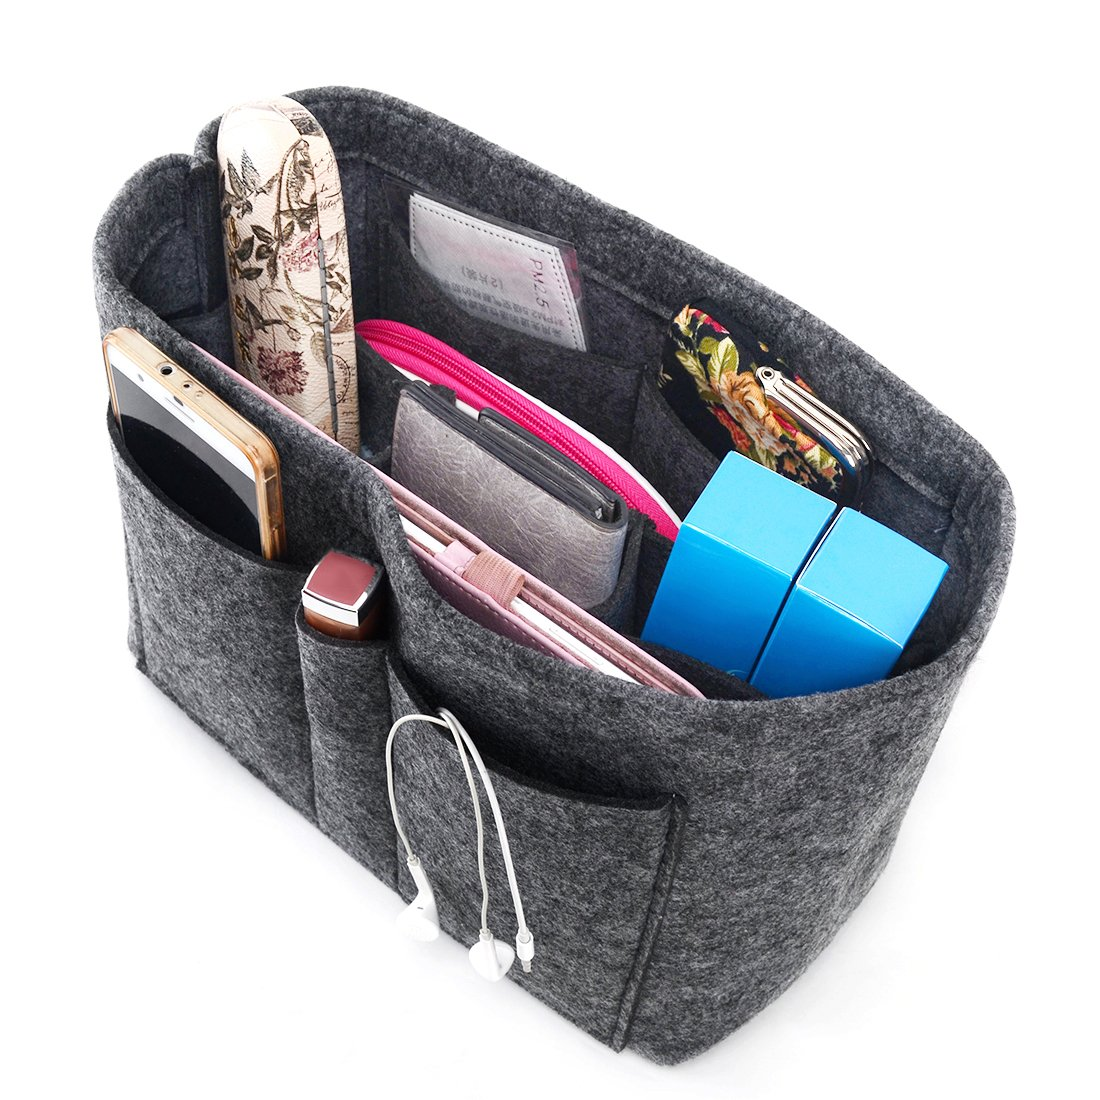 Enerhu Felt Insert Bags Handbag Tote Purse Organizer 10 Pockets Bag in Bag Backpack Travel Storage Pockets Grey L